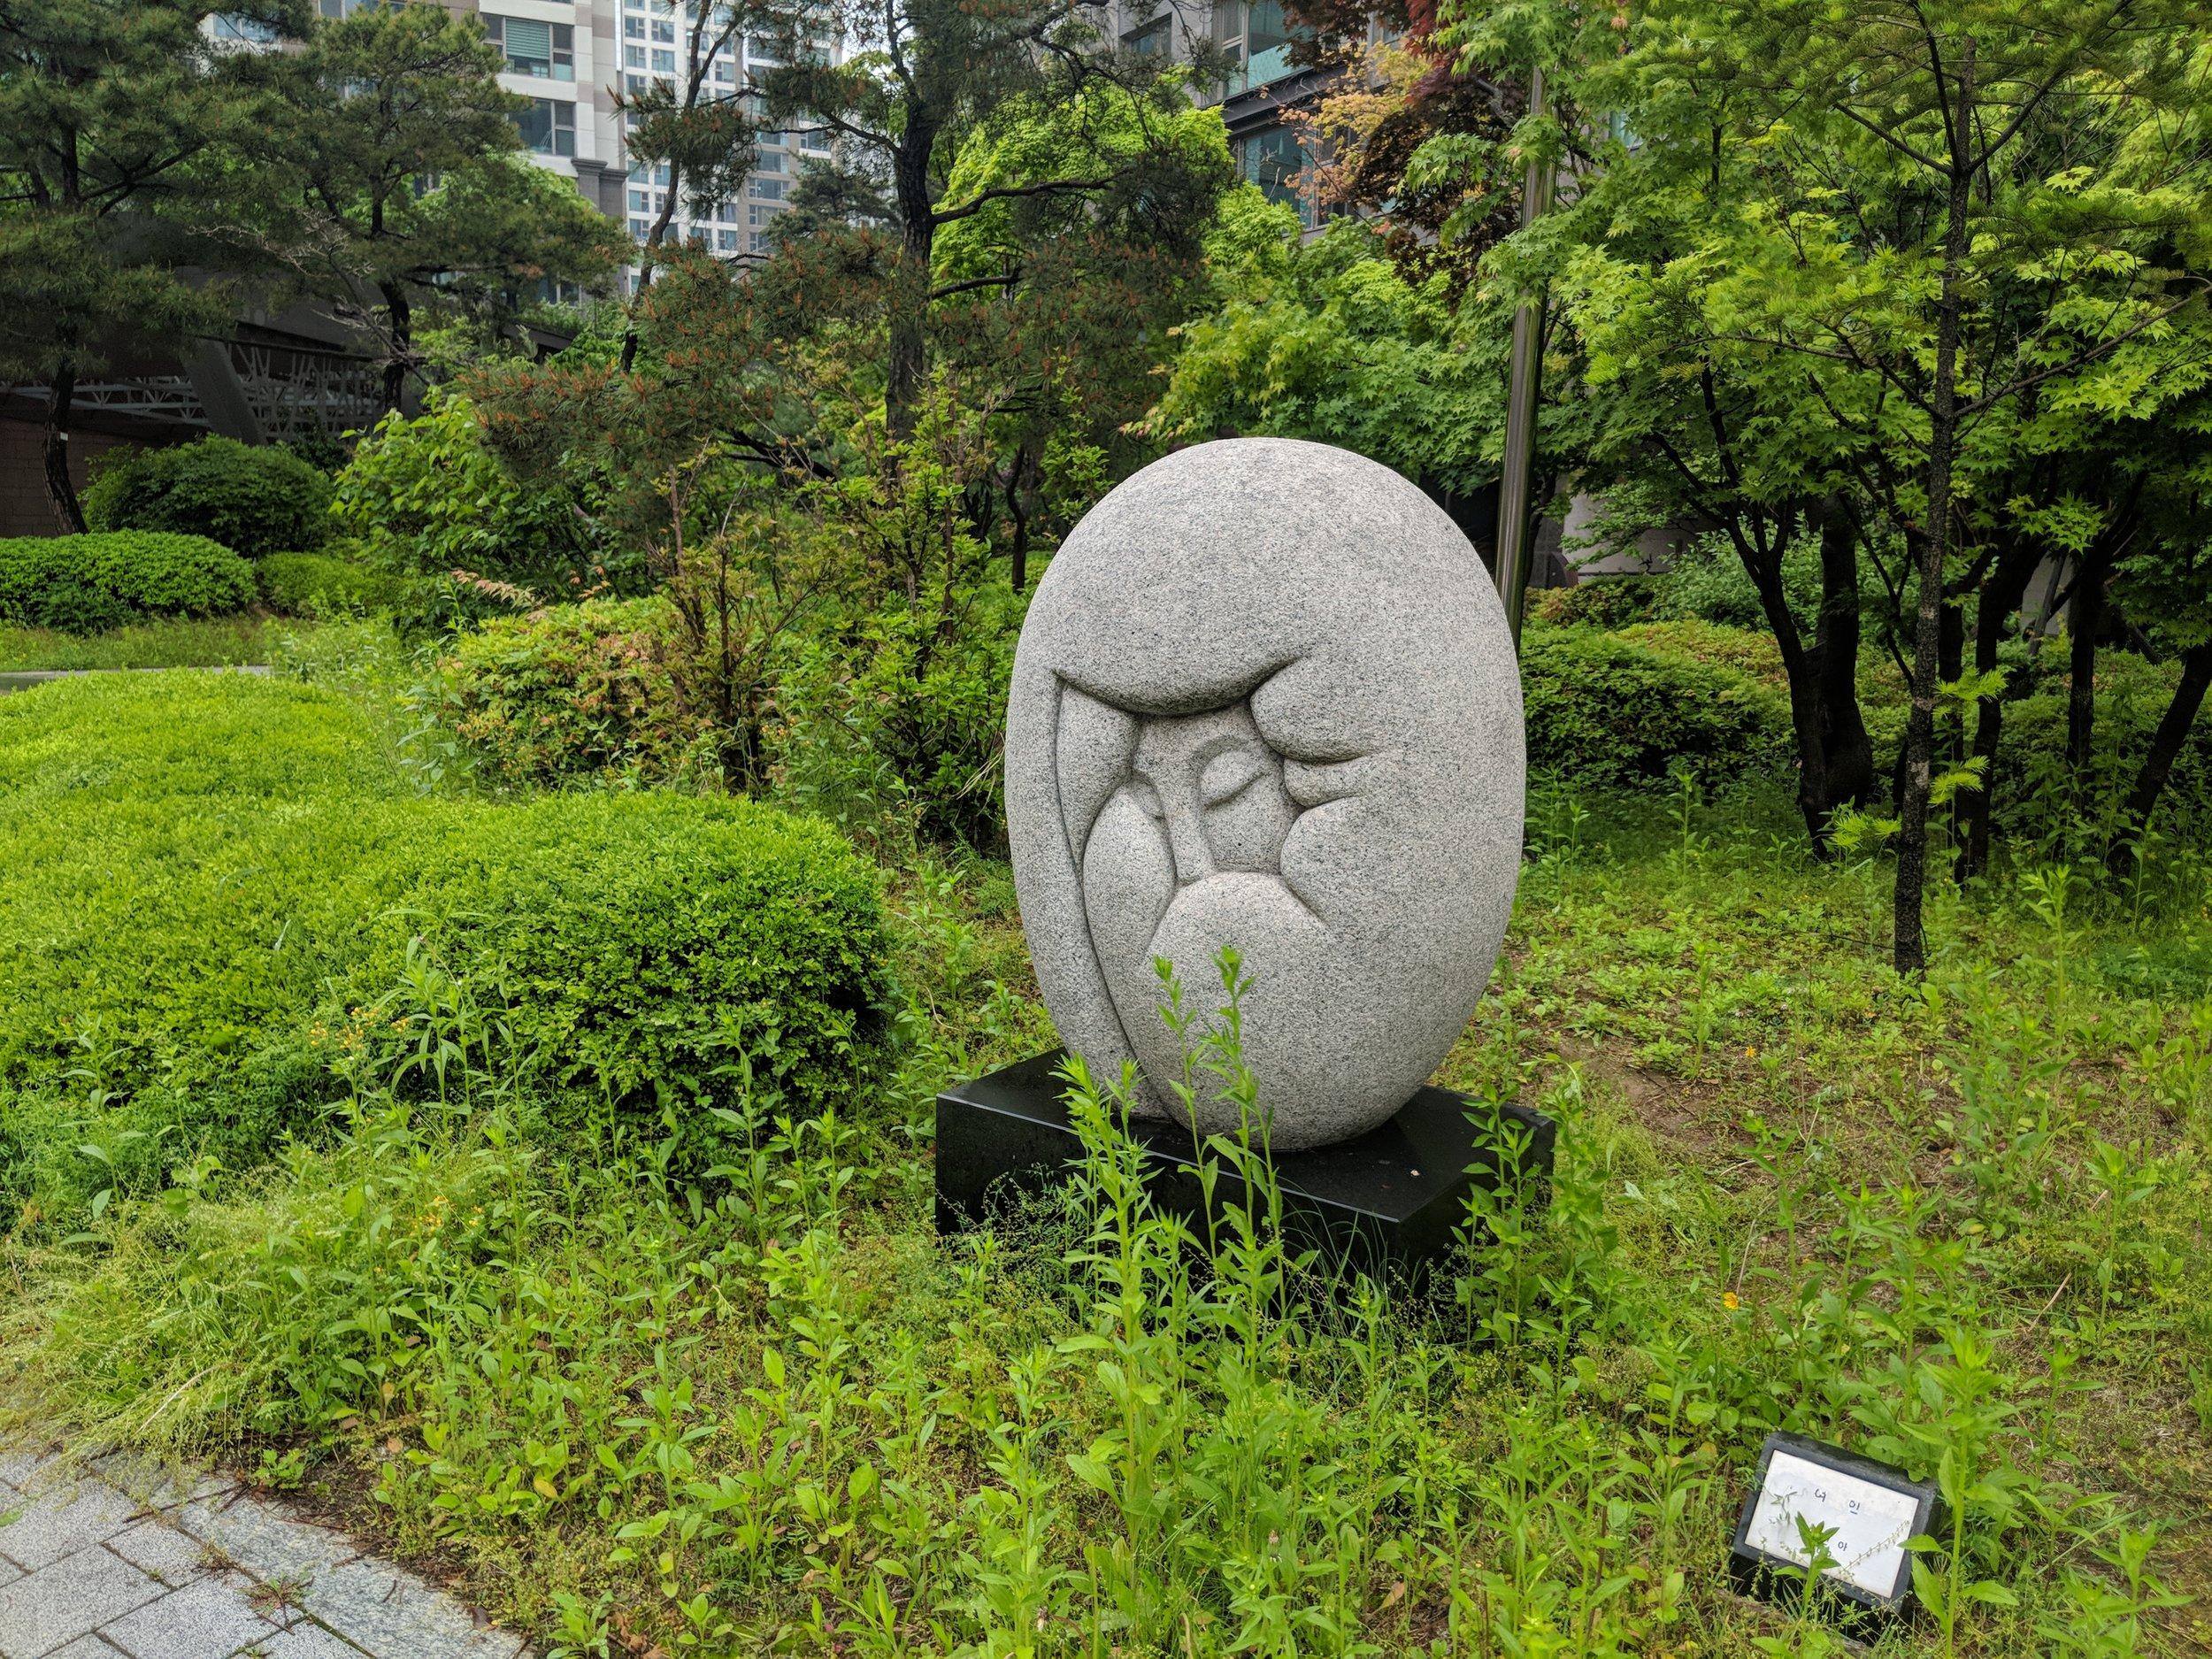 Woman_Granite_1.5m x 1.1m x 0.7m_South Korea_2010 (2).jpg